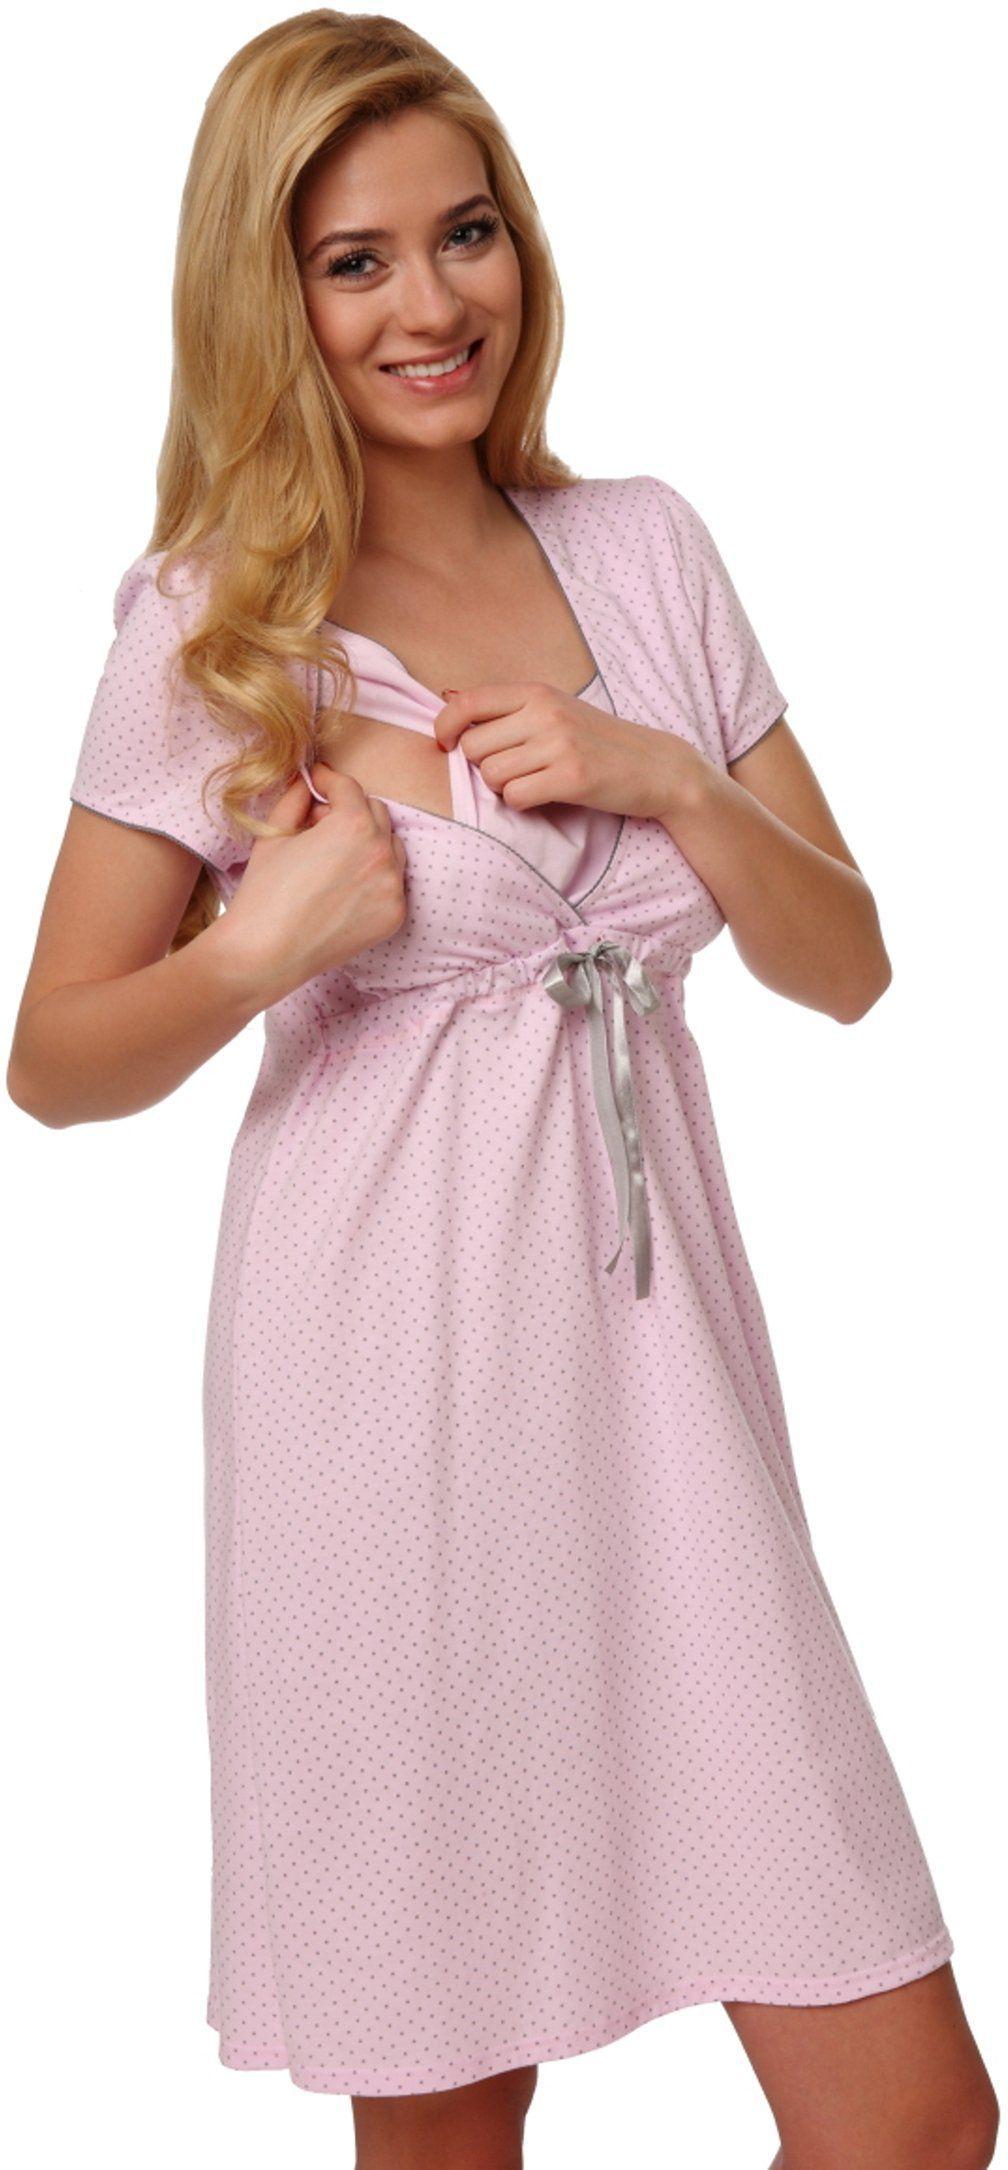 Italian fashion Koszula nocna Felicita różowa r. S 1